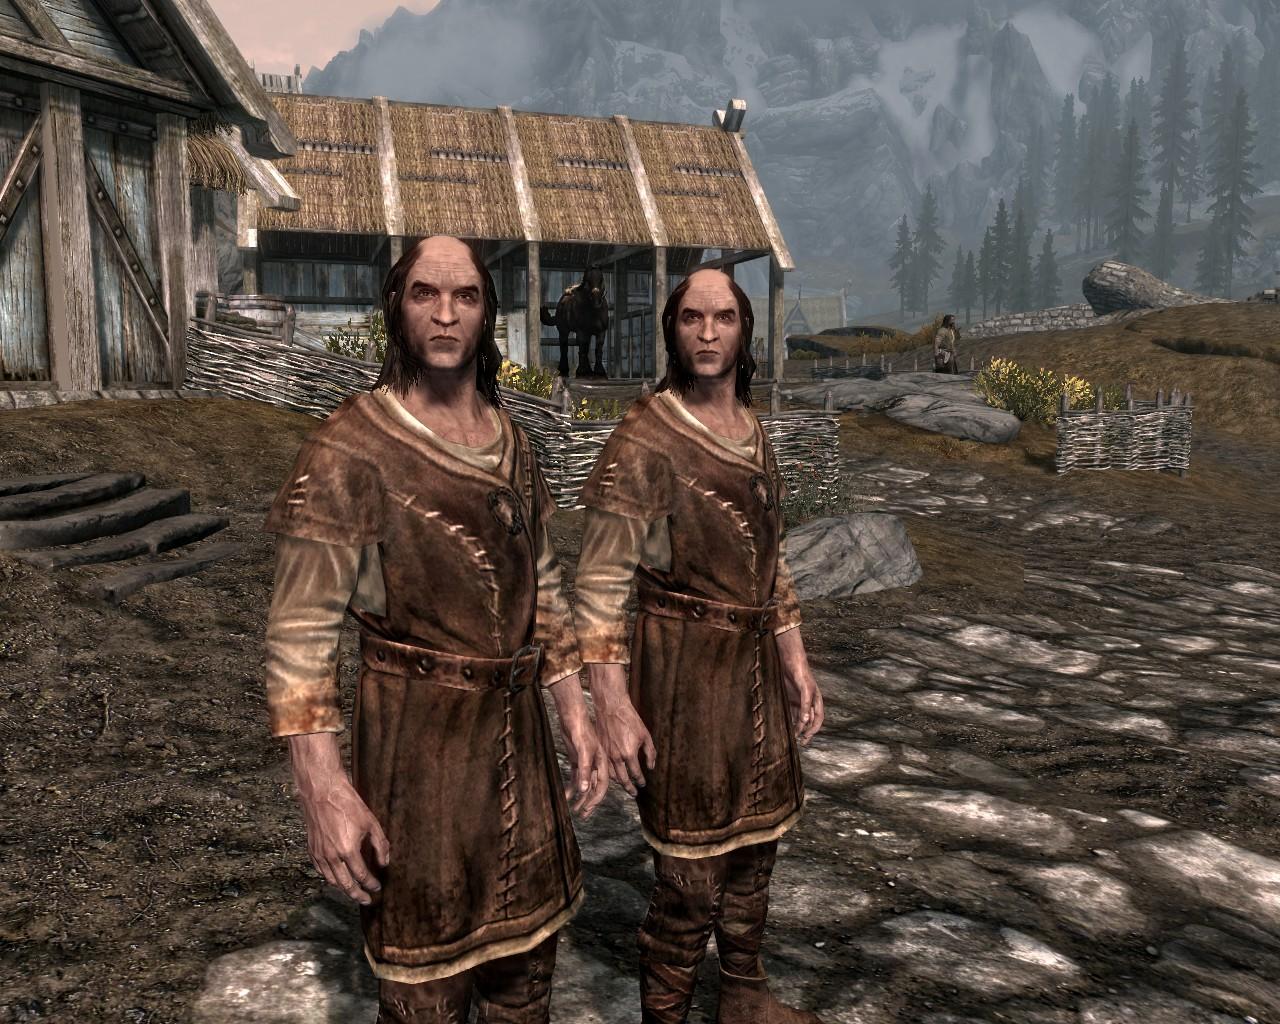 Lundegaard/Twins?